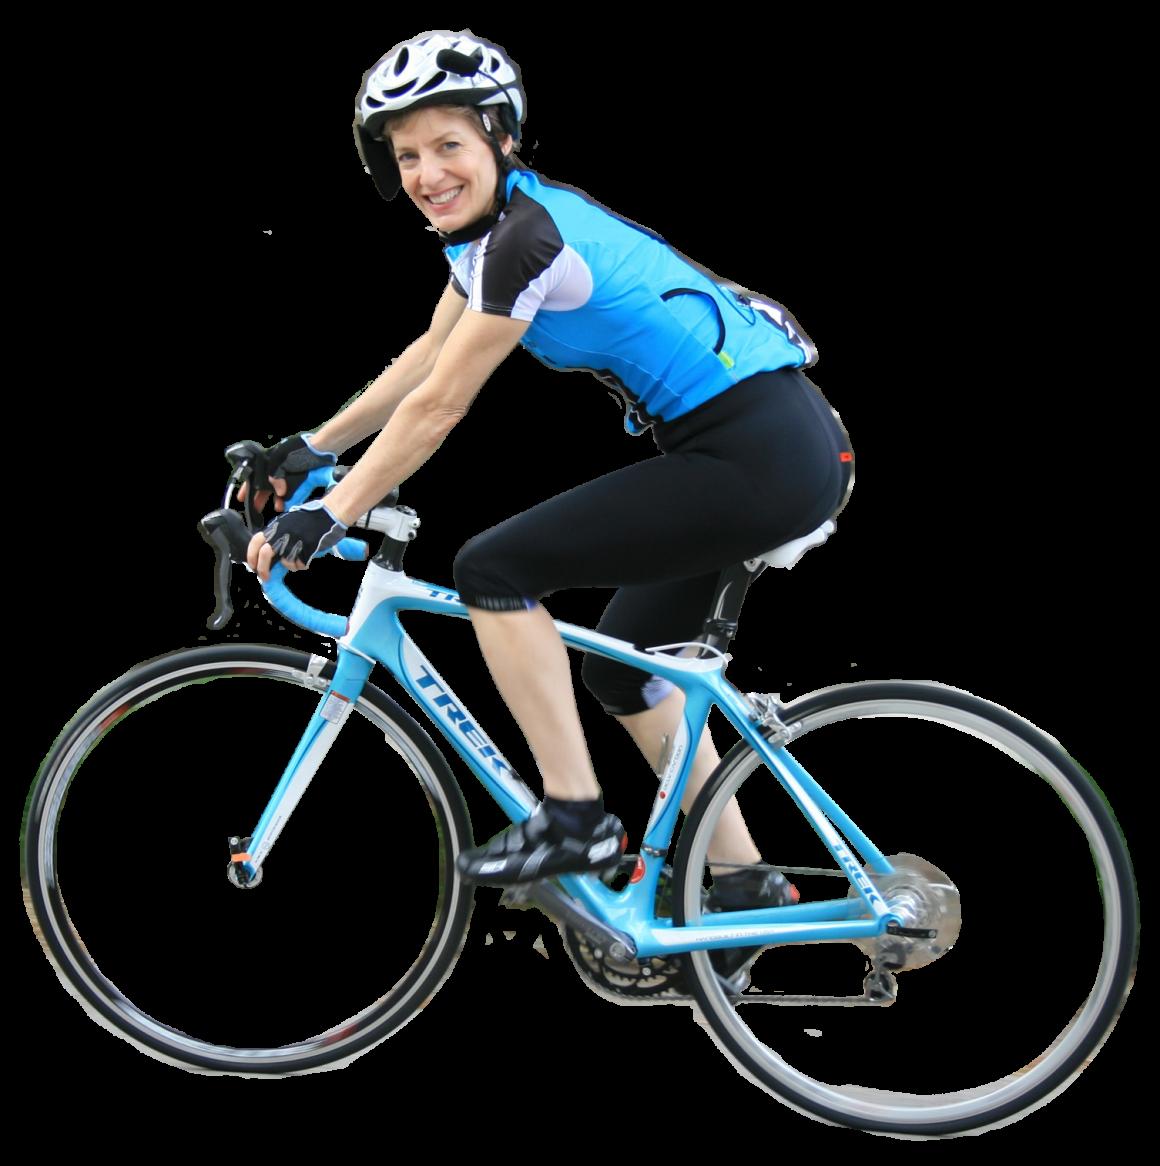 Ride A Bike PNG - 168406